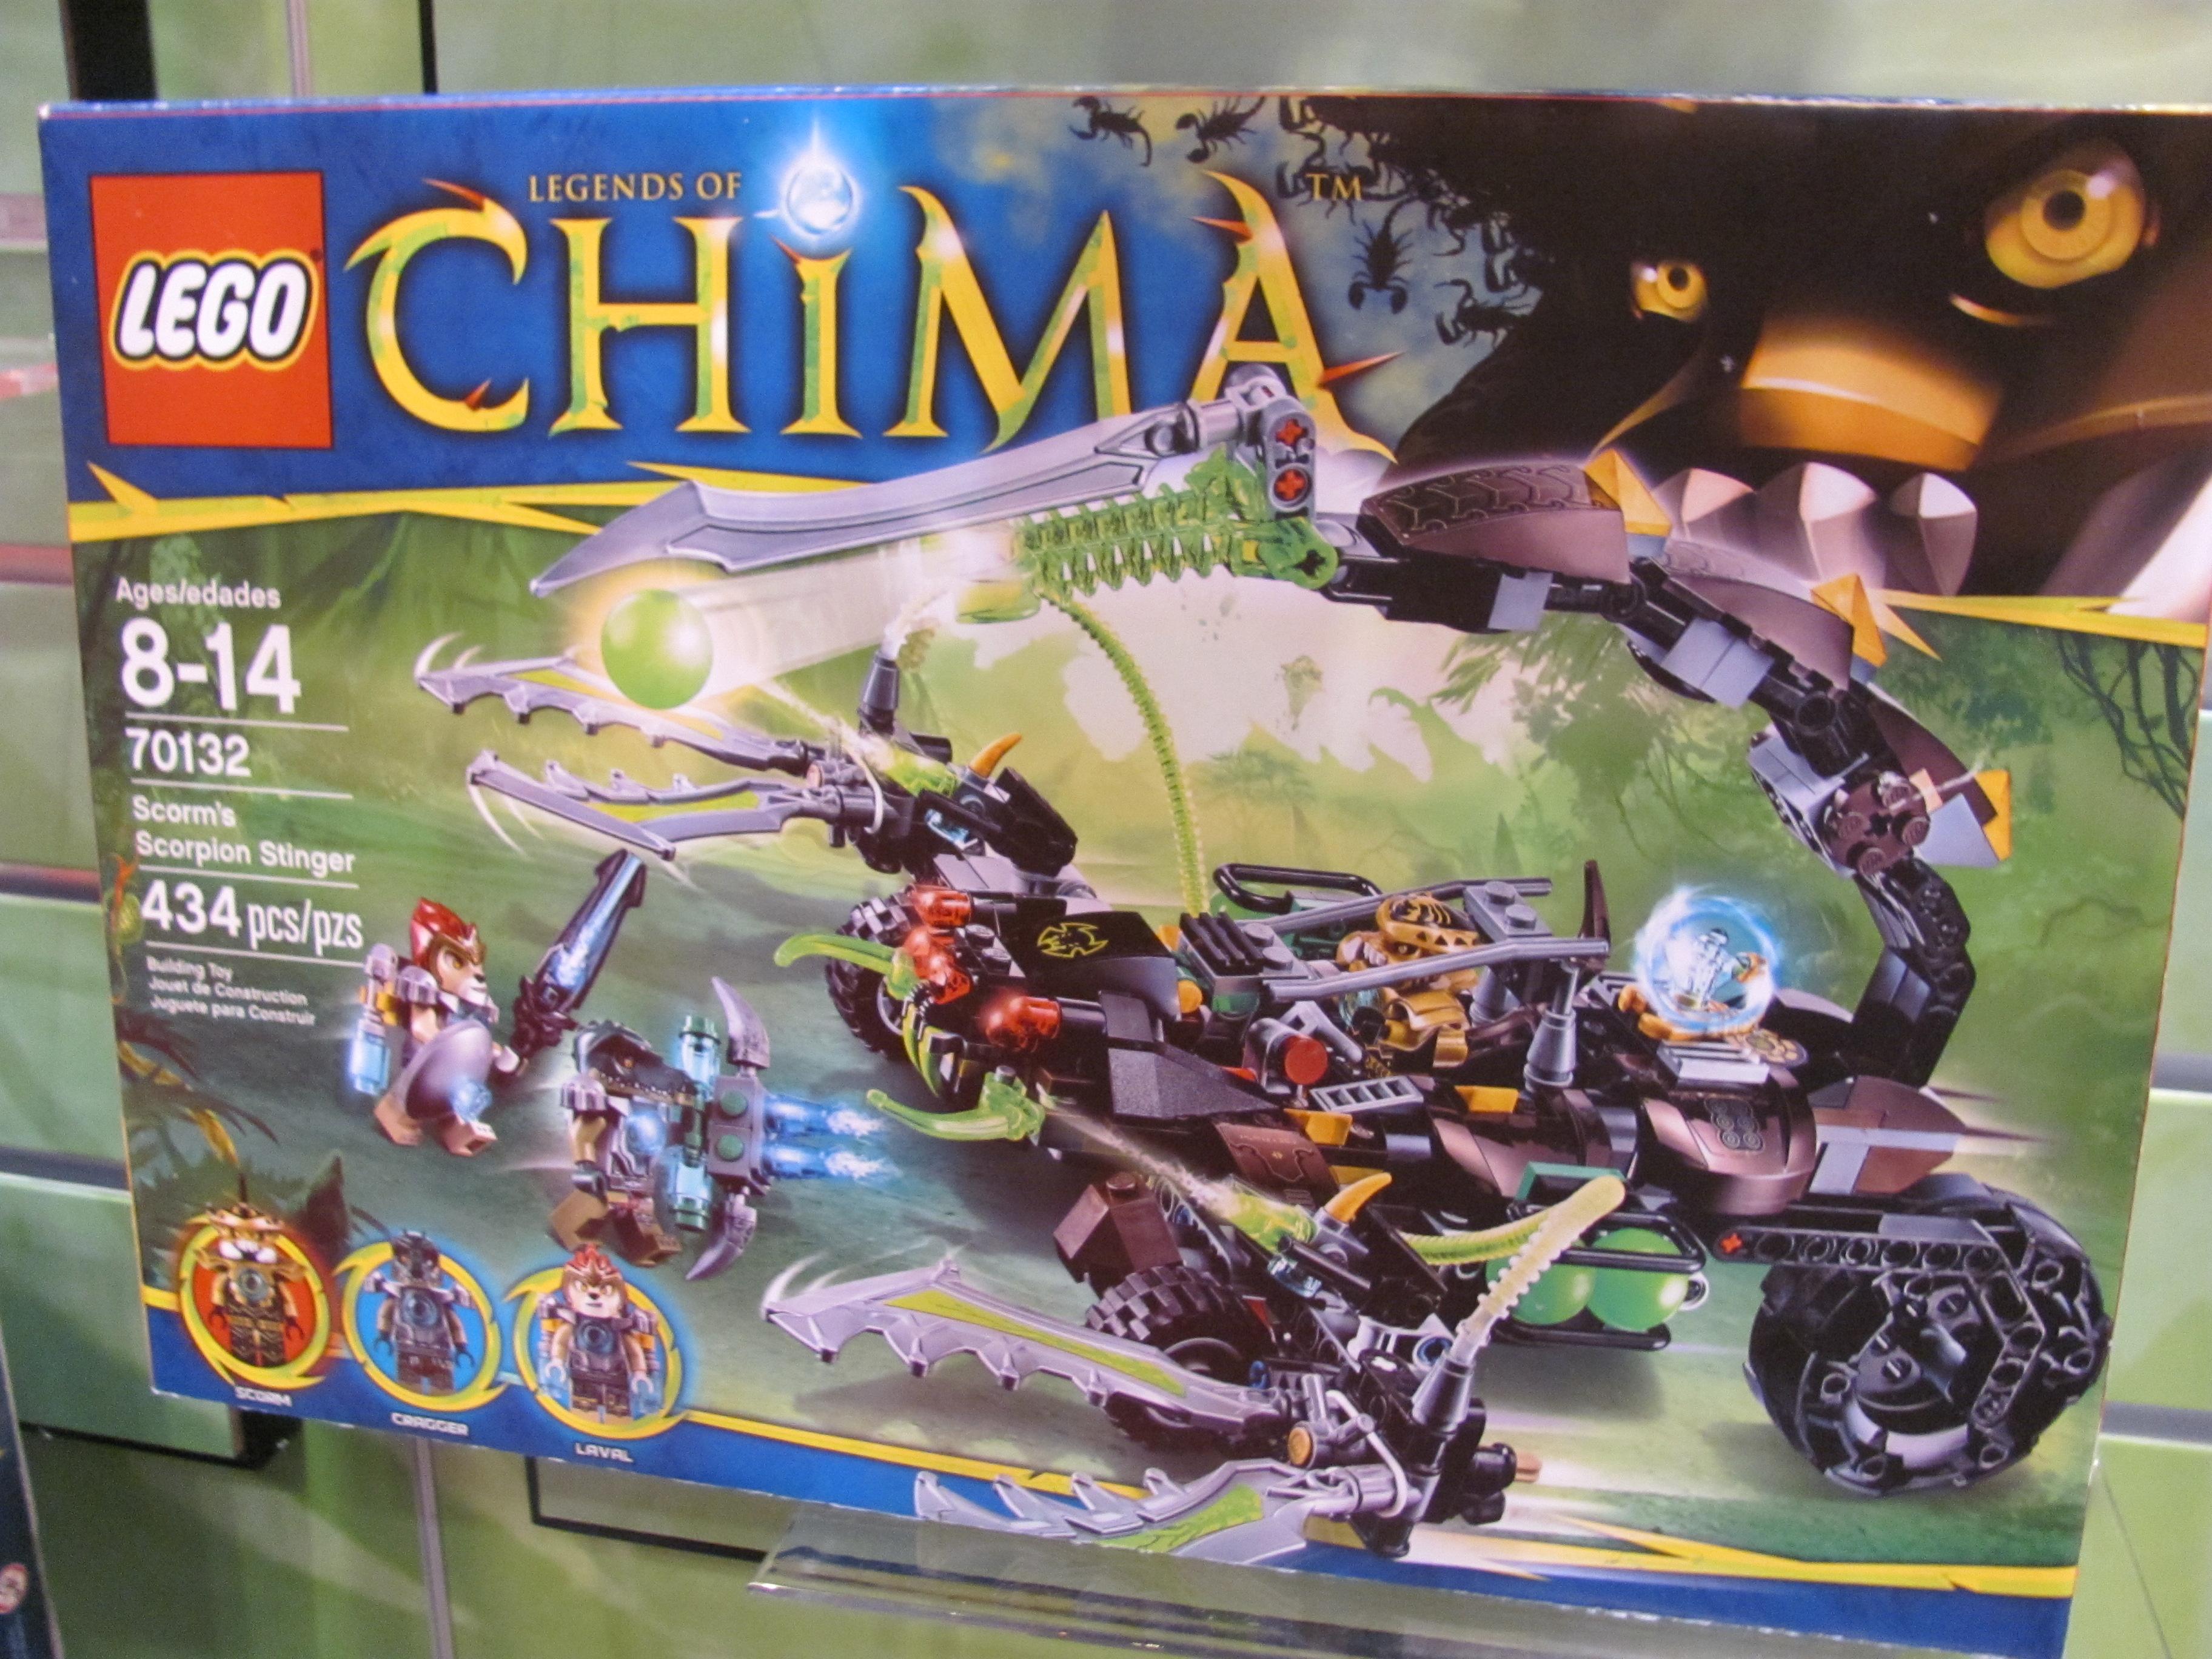 Lego Legends of Chima Scorm's Scorpion Stinger by Purple Pawn